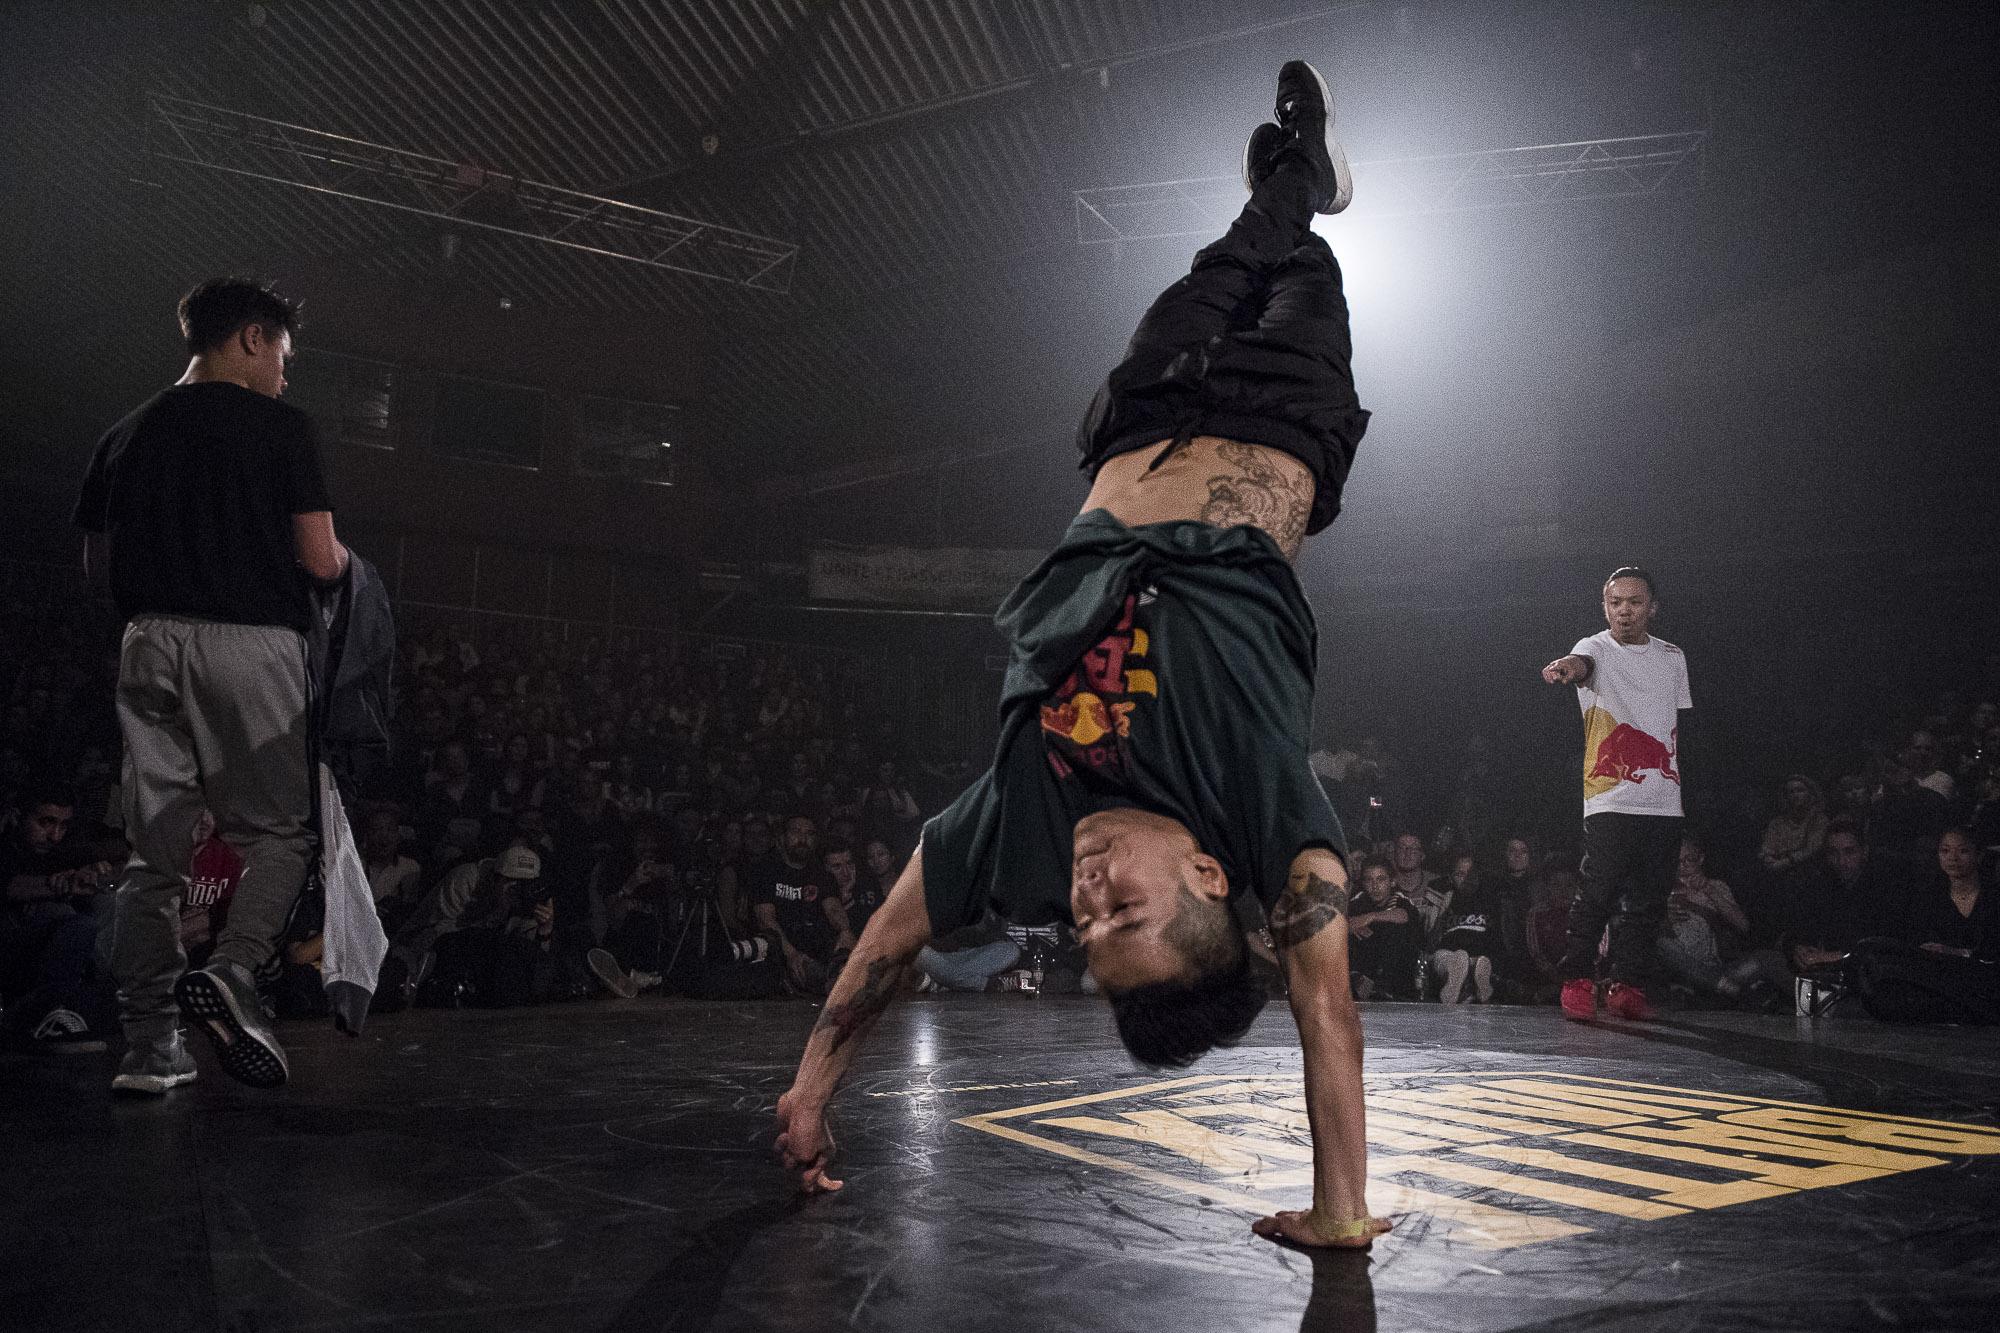 Bboy Hong10 during the Second Round of Battle De Vaulx Against Hustle Kidz 2